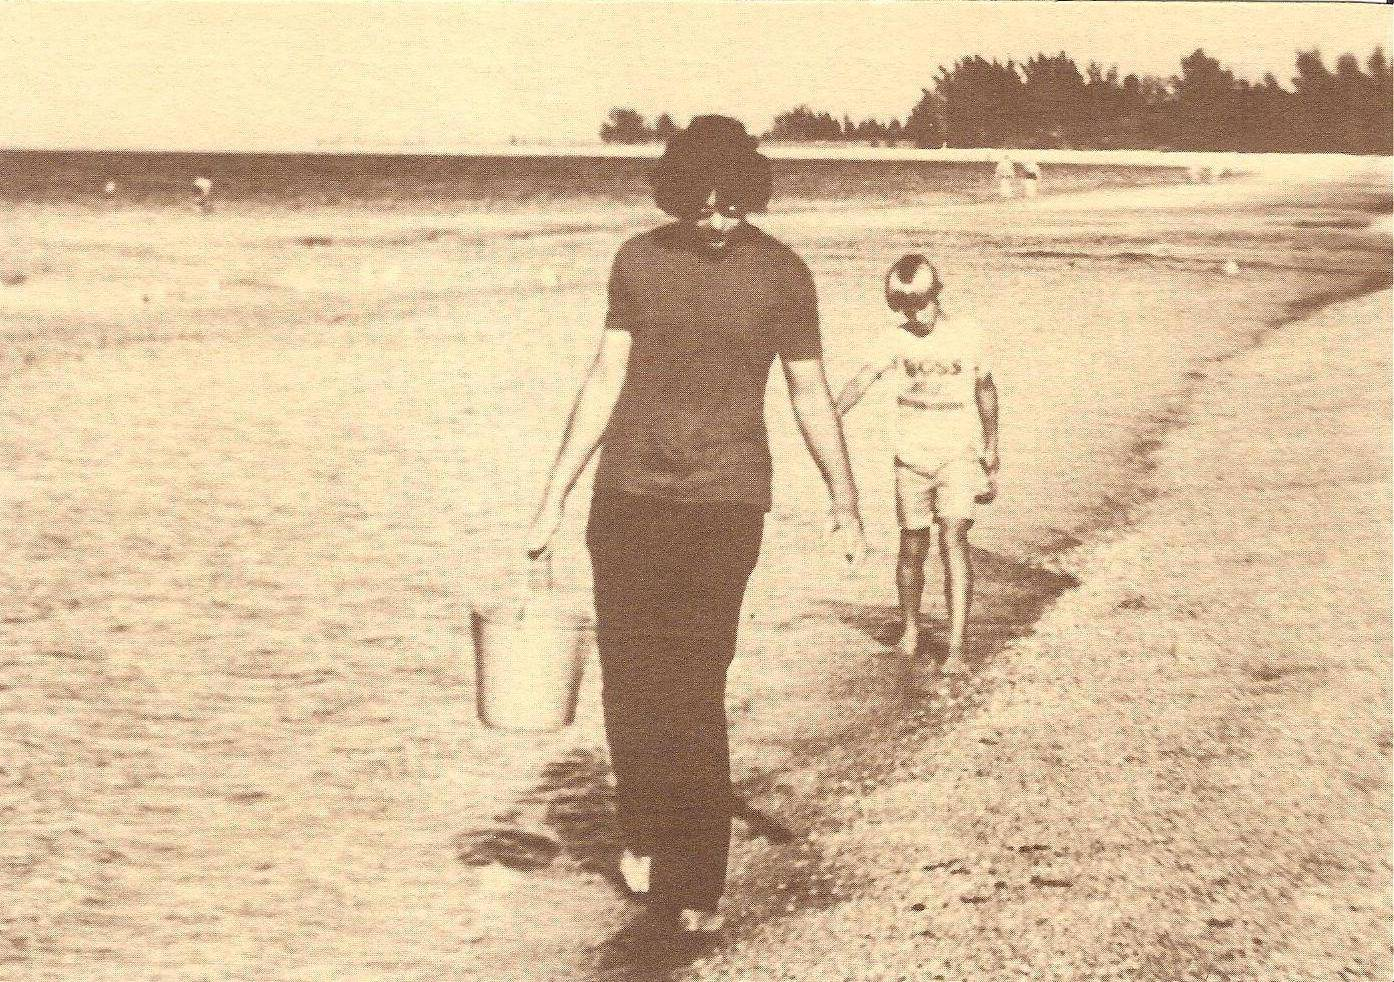 Me, Robby, Marco Island, Florida, 1974